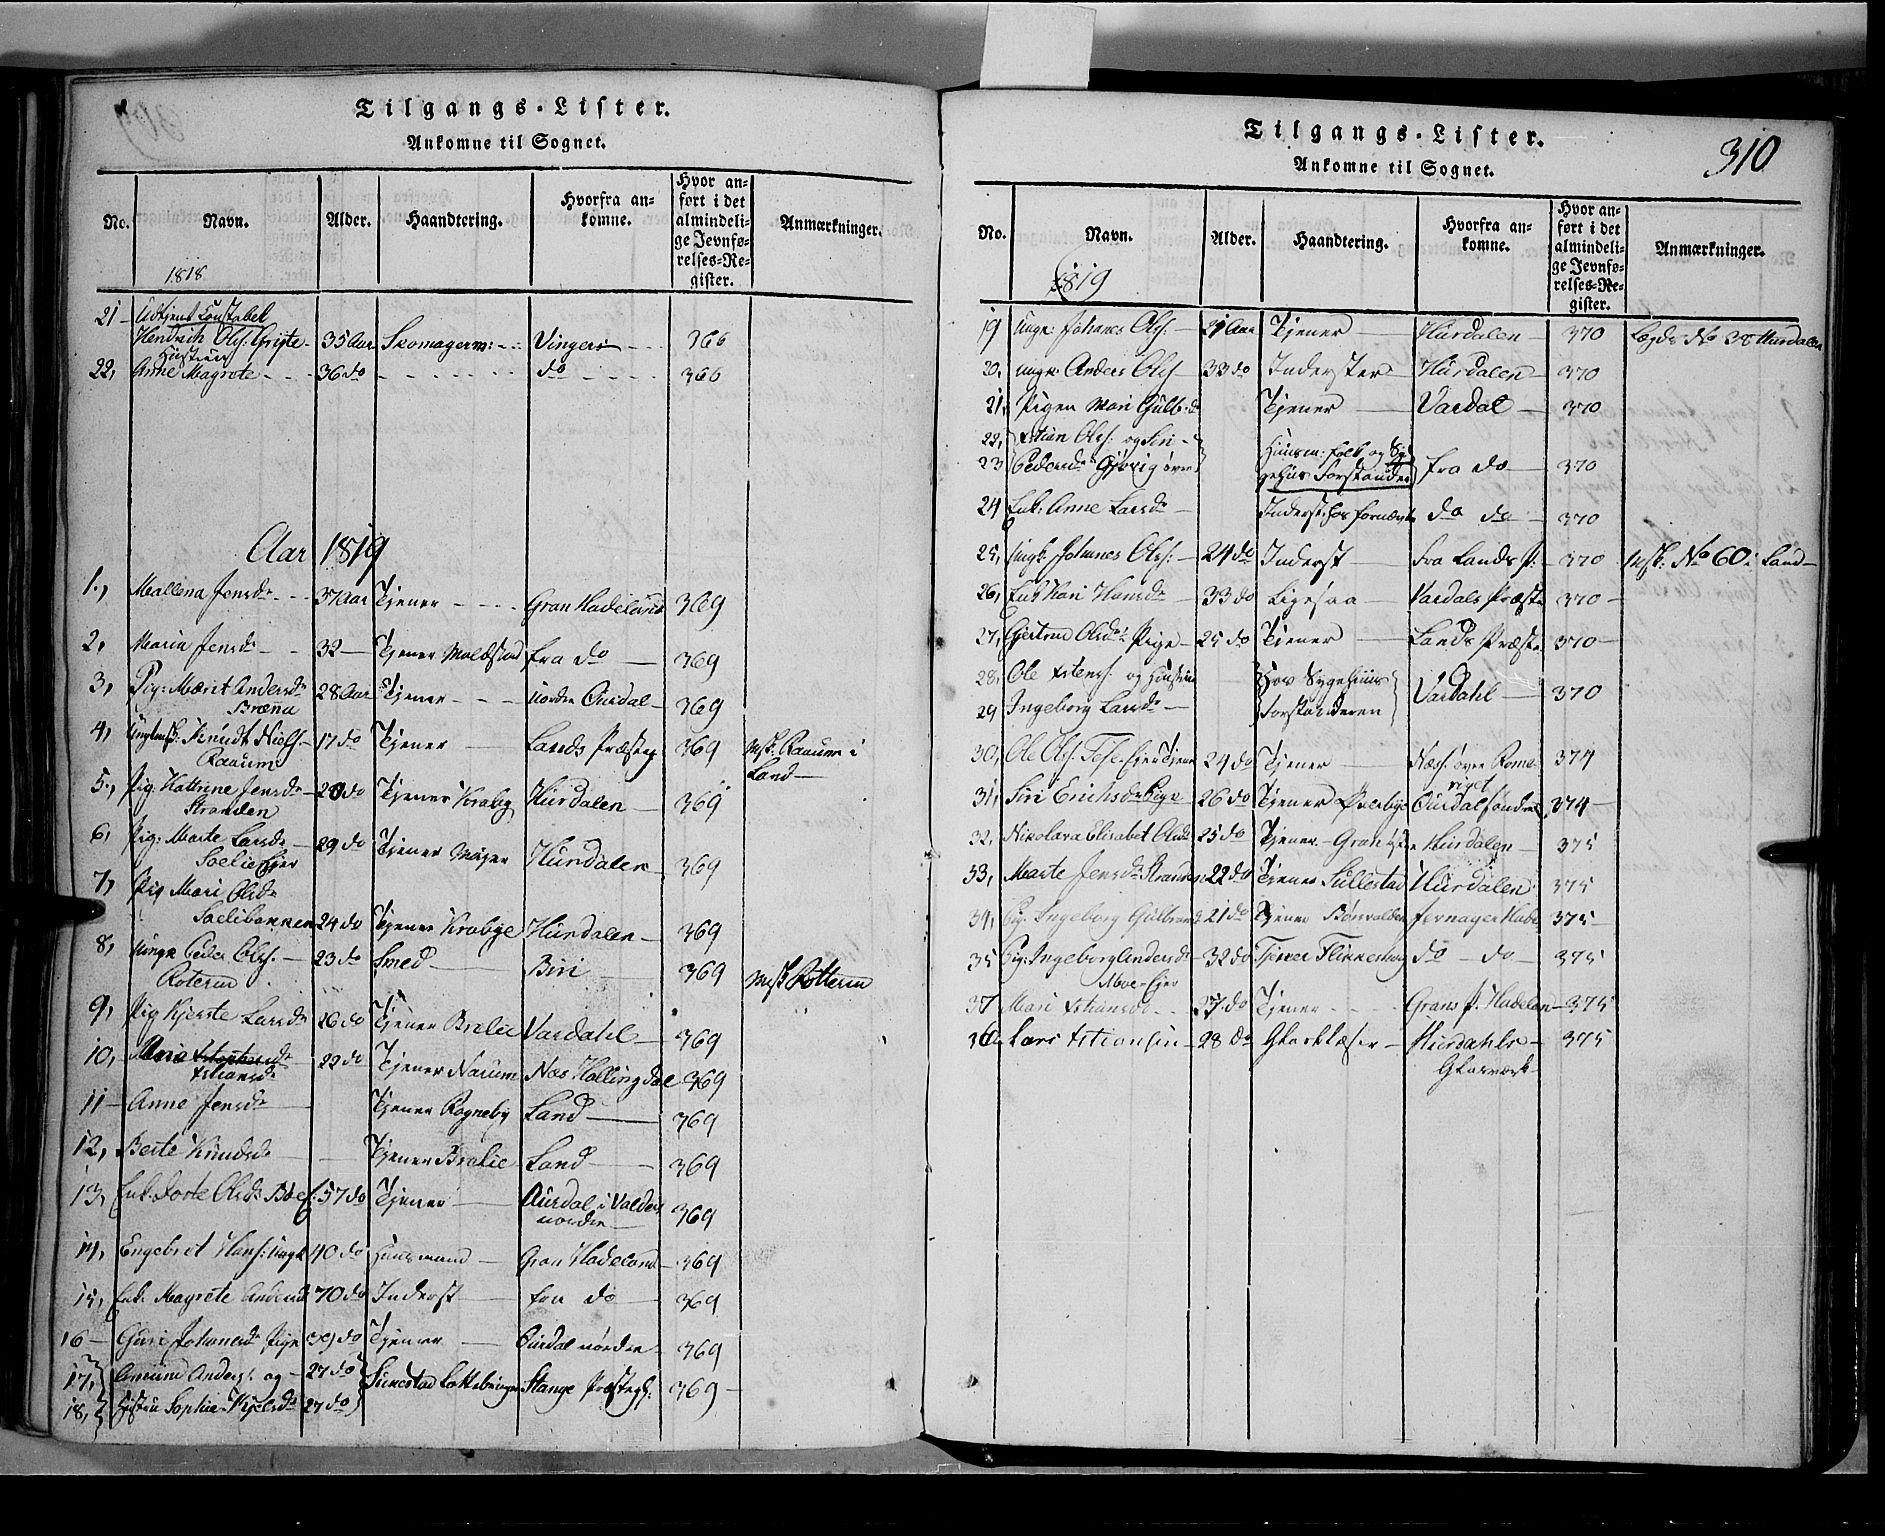 SAH, Toten prestekontor, Klokkerbok nr. 1, 1814-1820, s. 310